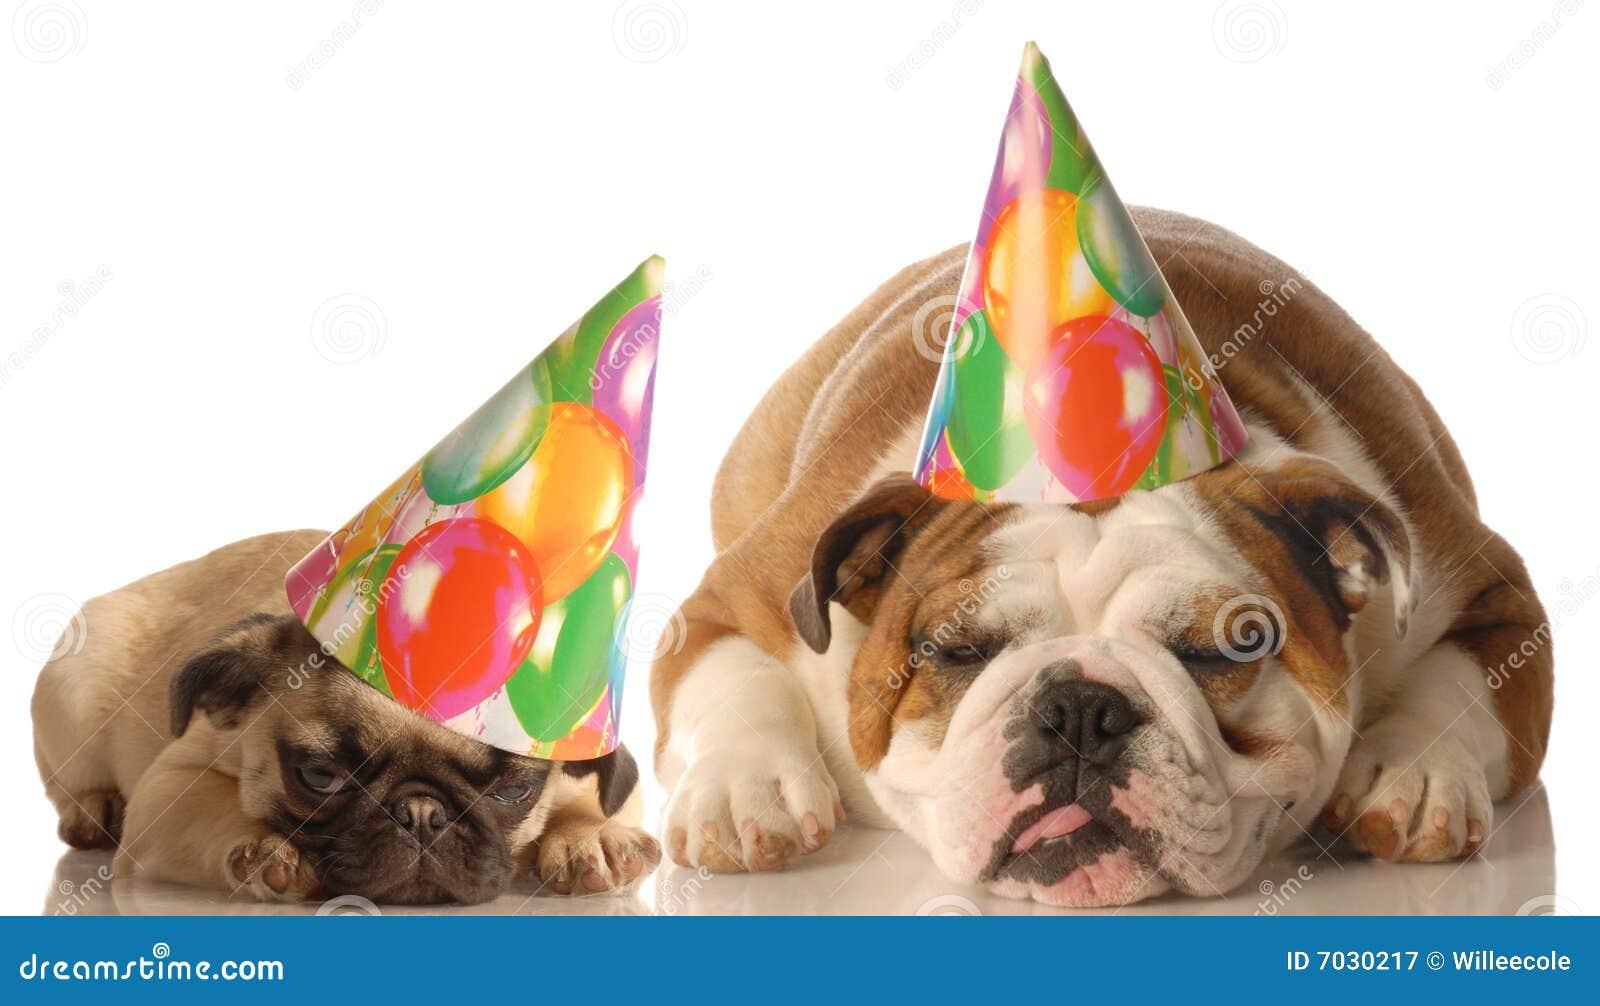 English Bulldog And Pug Puppy Wearing Birthday Hat Isolated On White Background